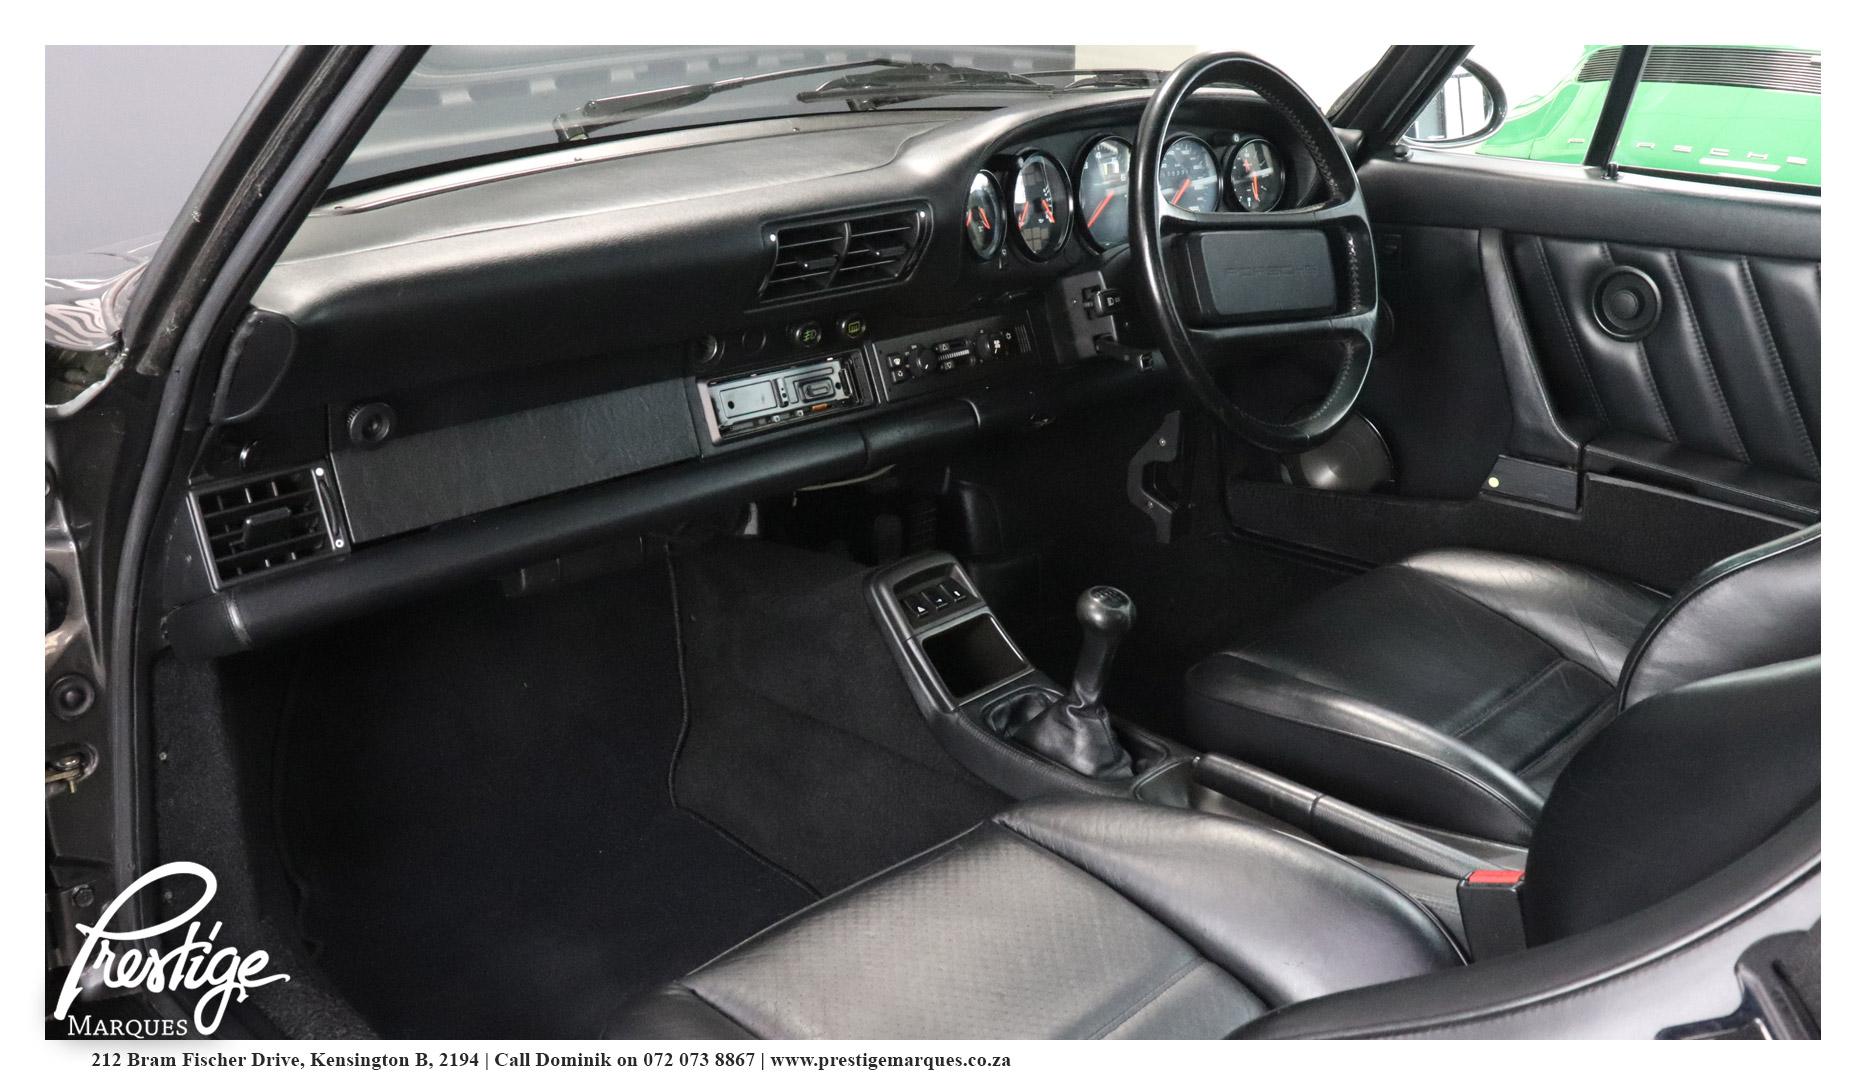 Porsche-911-964-turbo-3:3-Prestige-Marques-Sandton-Randburg-16